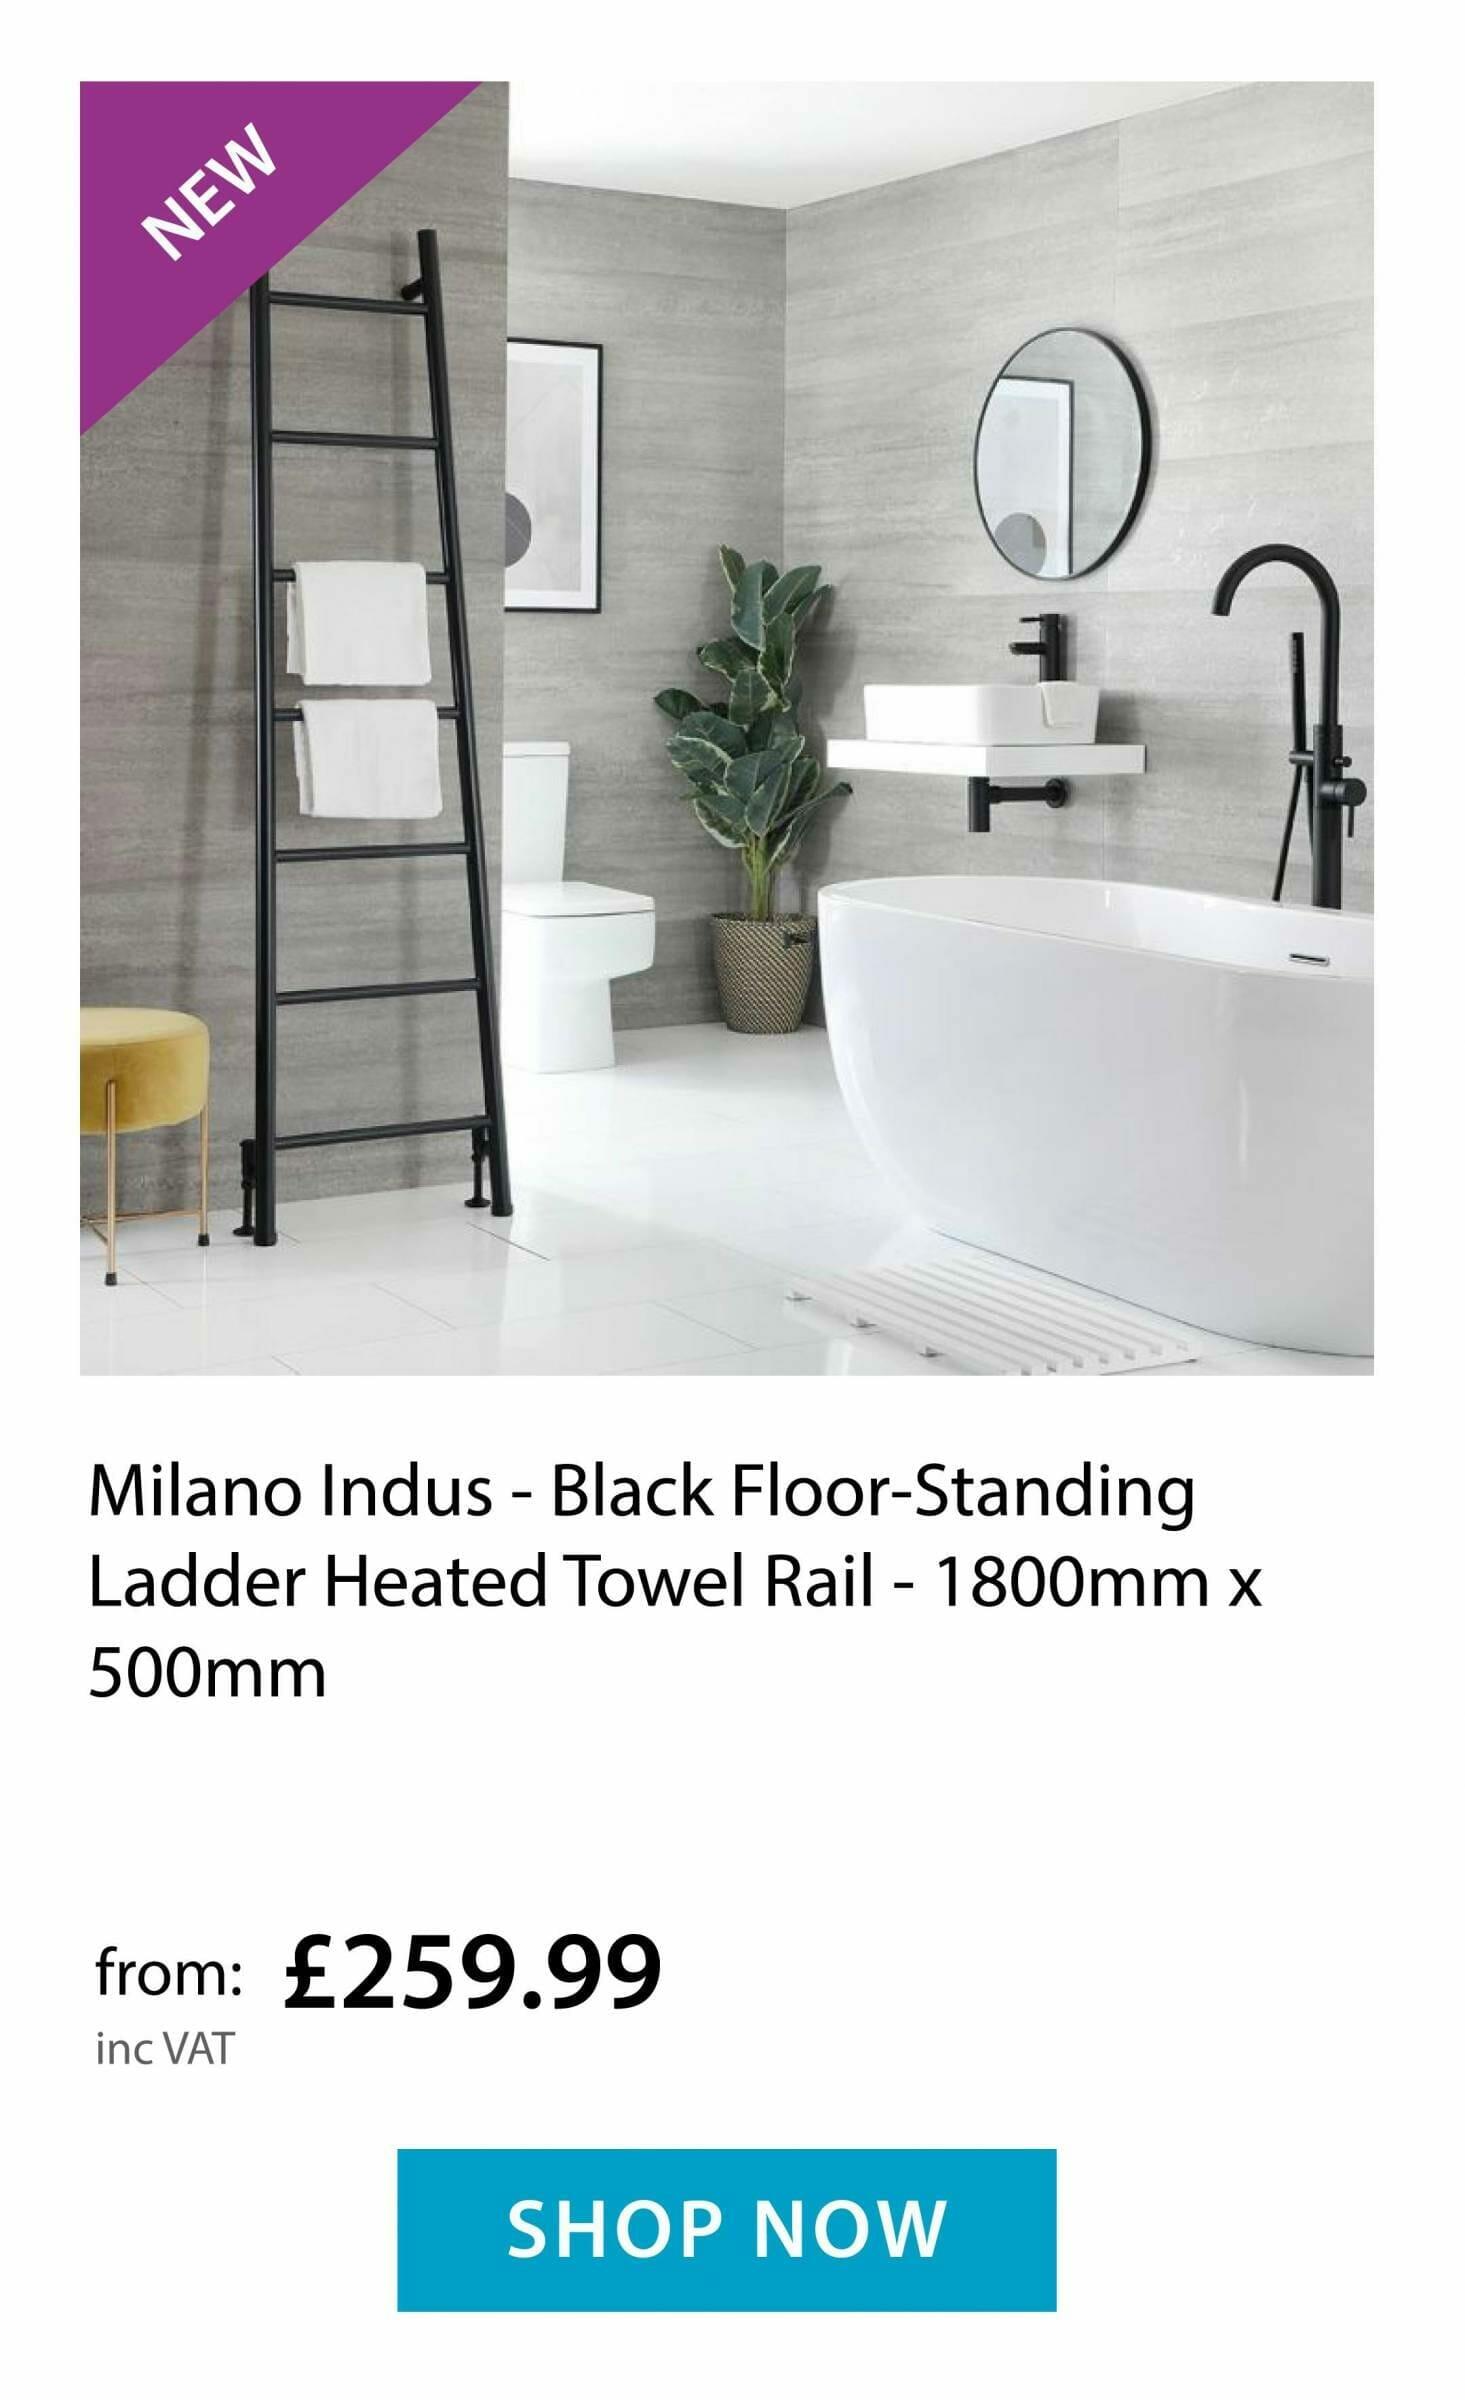 Milano Indus - Heated Towel Ladder Rail